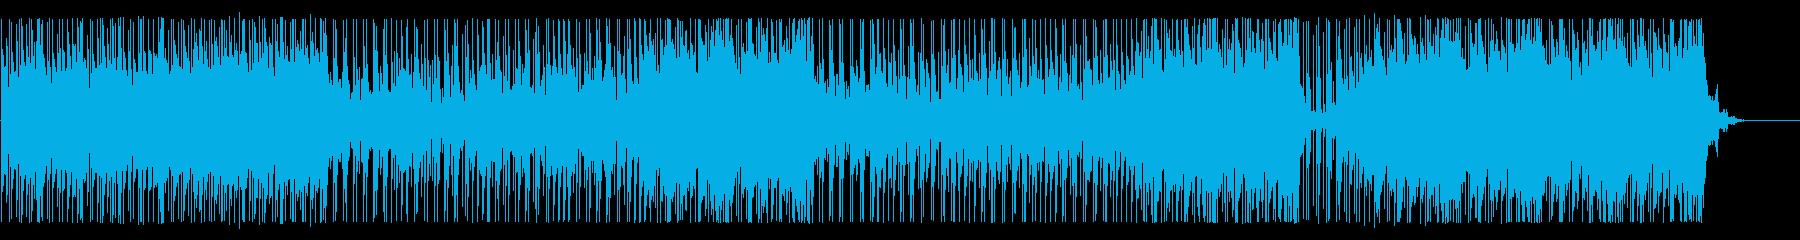 PowerBassHip-HopBeatの再生済みの波形